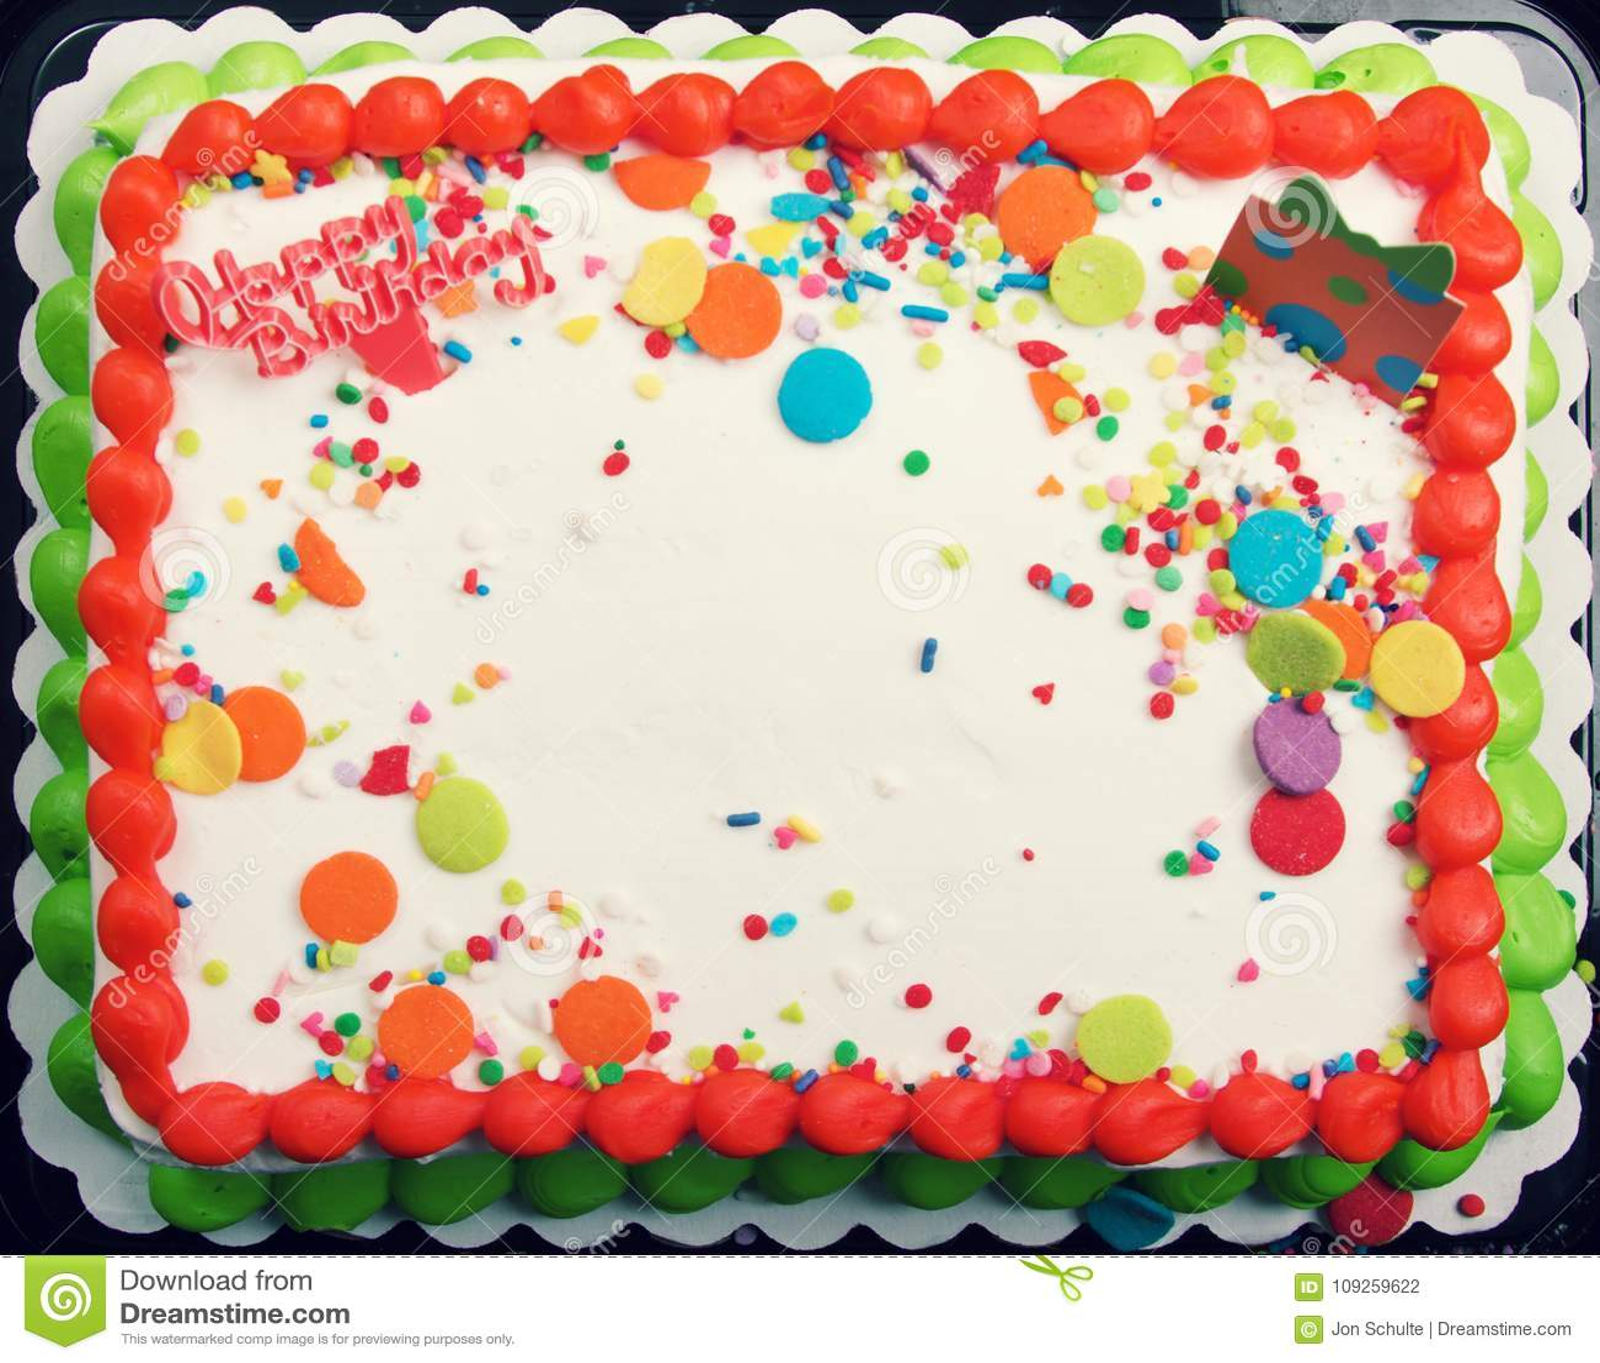 Decorated Cake Icing Background